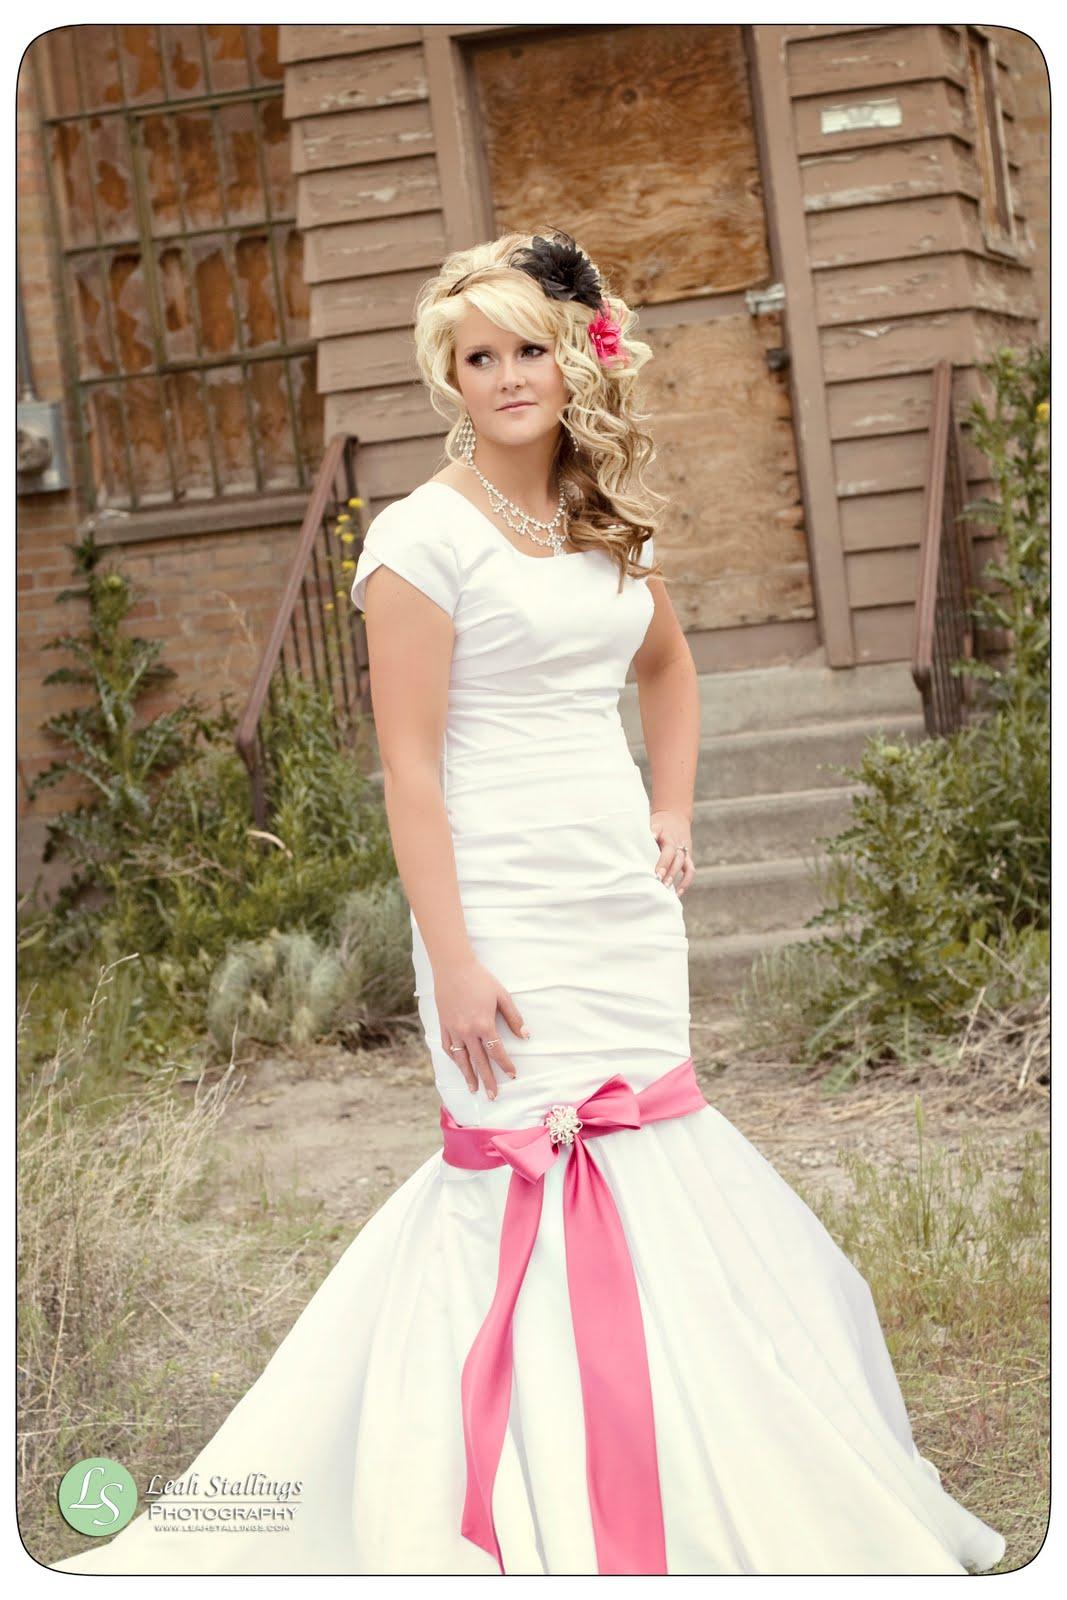 Leah stallings artistic portraiture dress reheasal idaho for Wedding dresses idaho falls